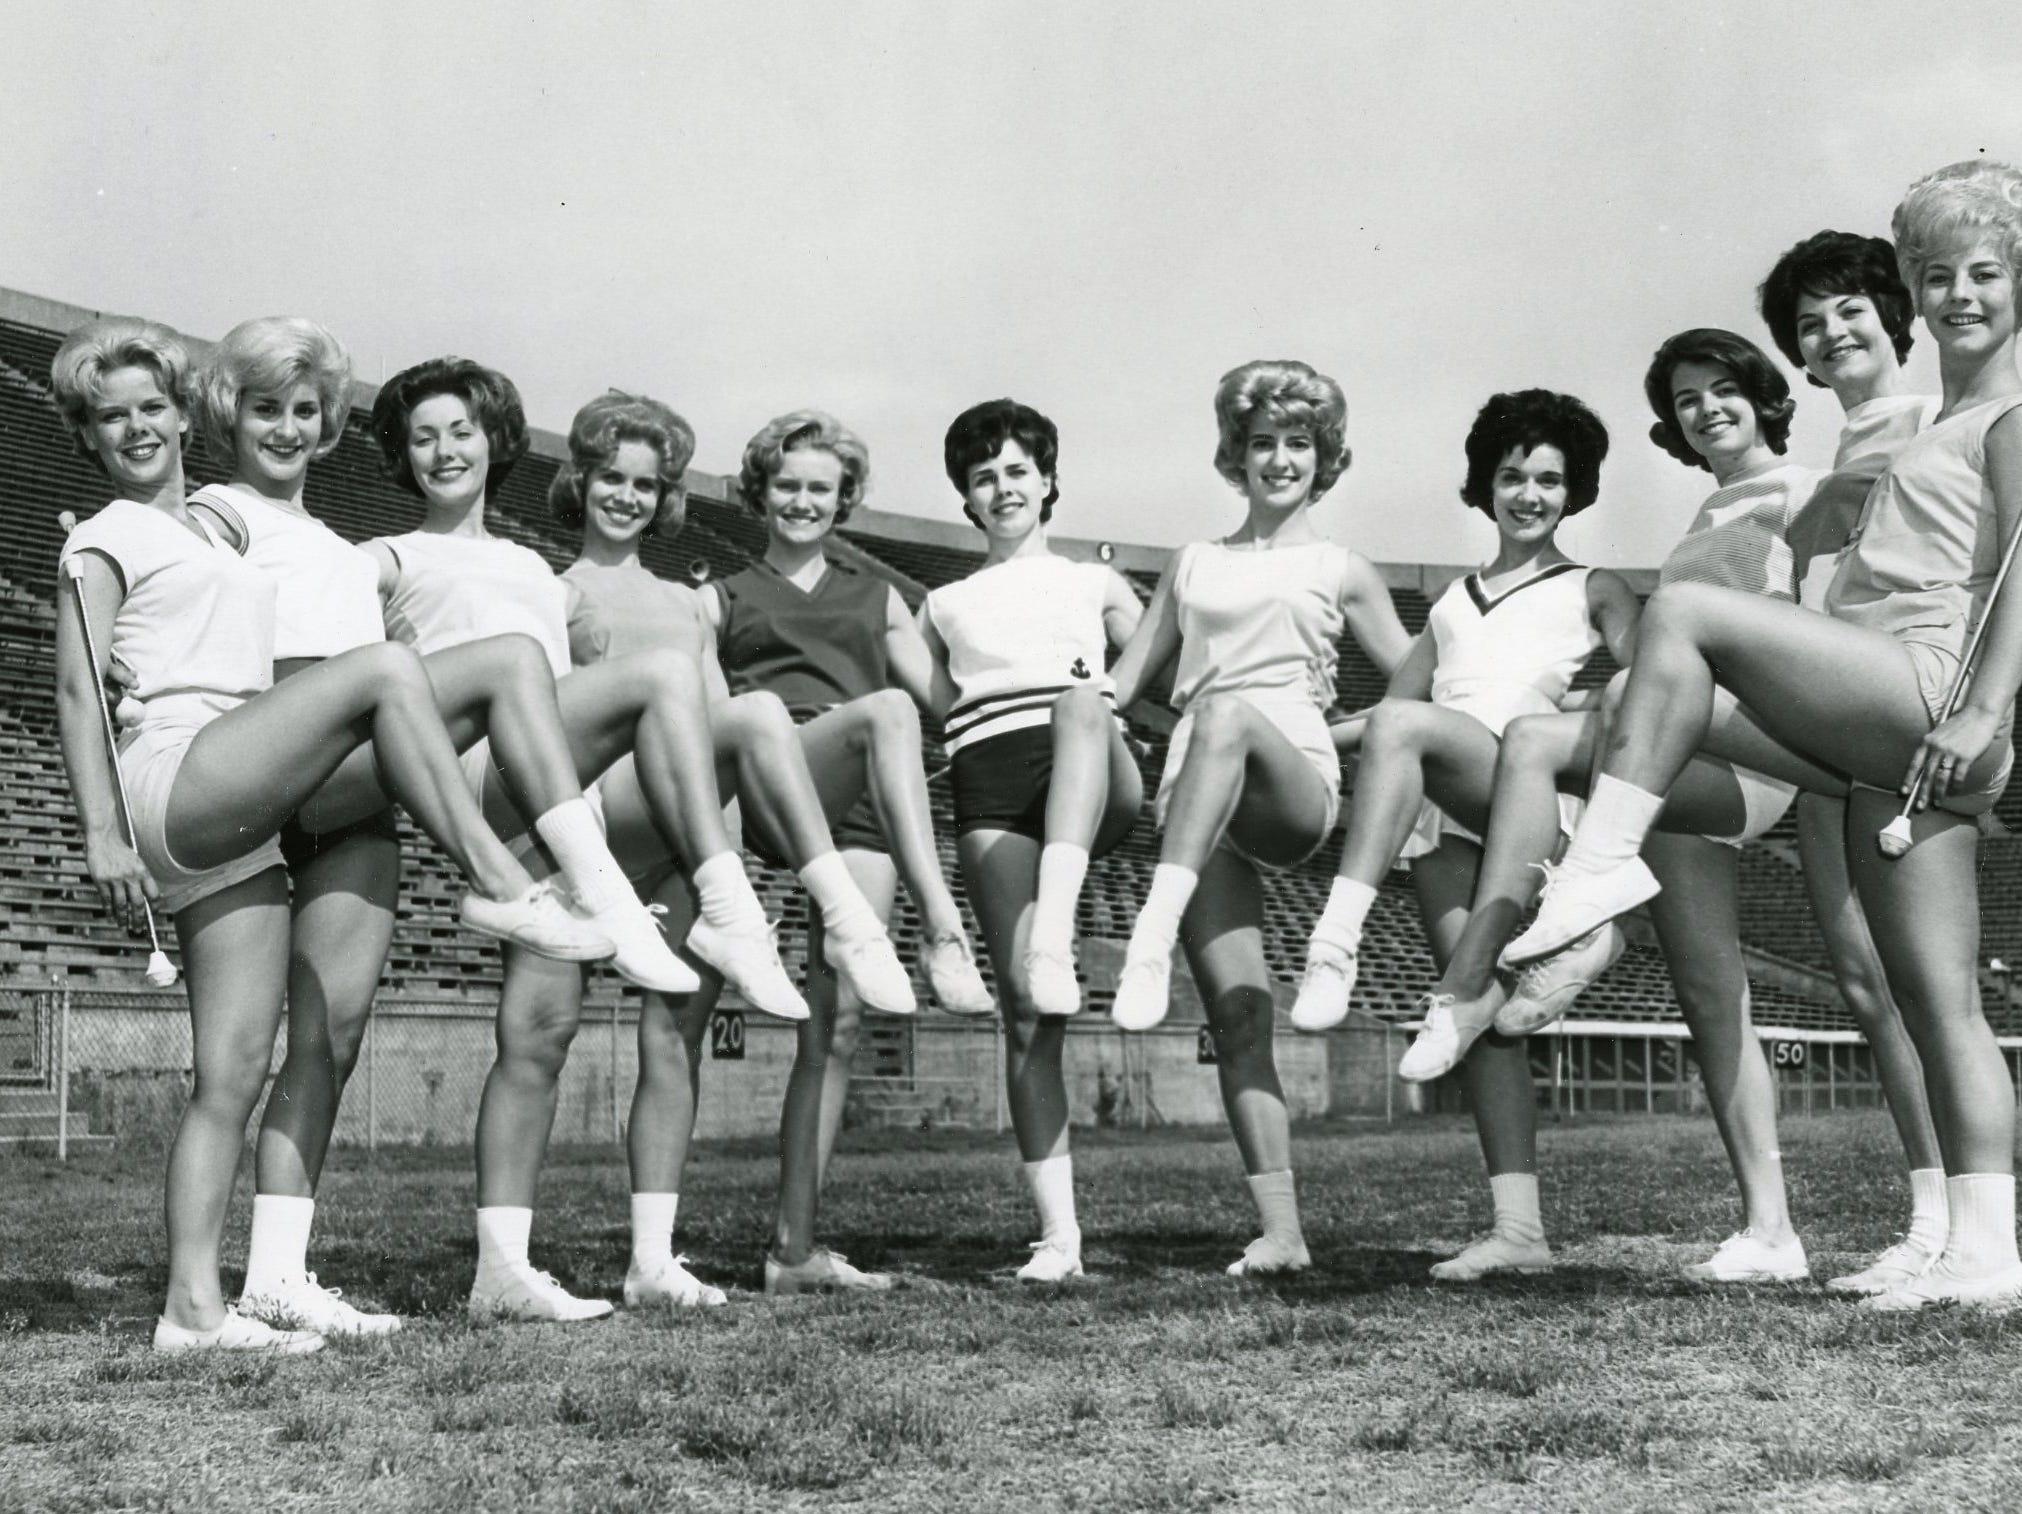 "UT ""High Steppers"" for the 1963/64 season included from left: Mary Nicholon, Brenda Murrell, Valerie Foster, Judy Barton, Melinda Hewgley, Patti Stuart, Brenda Flowers, Marcia Austin, Bette Carlson, Betty Sue Little and DeAnna Smith."